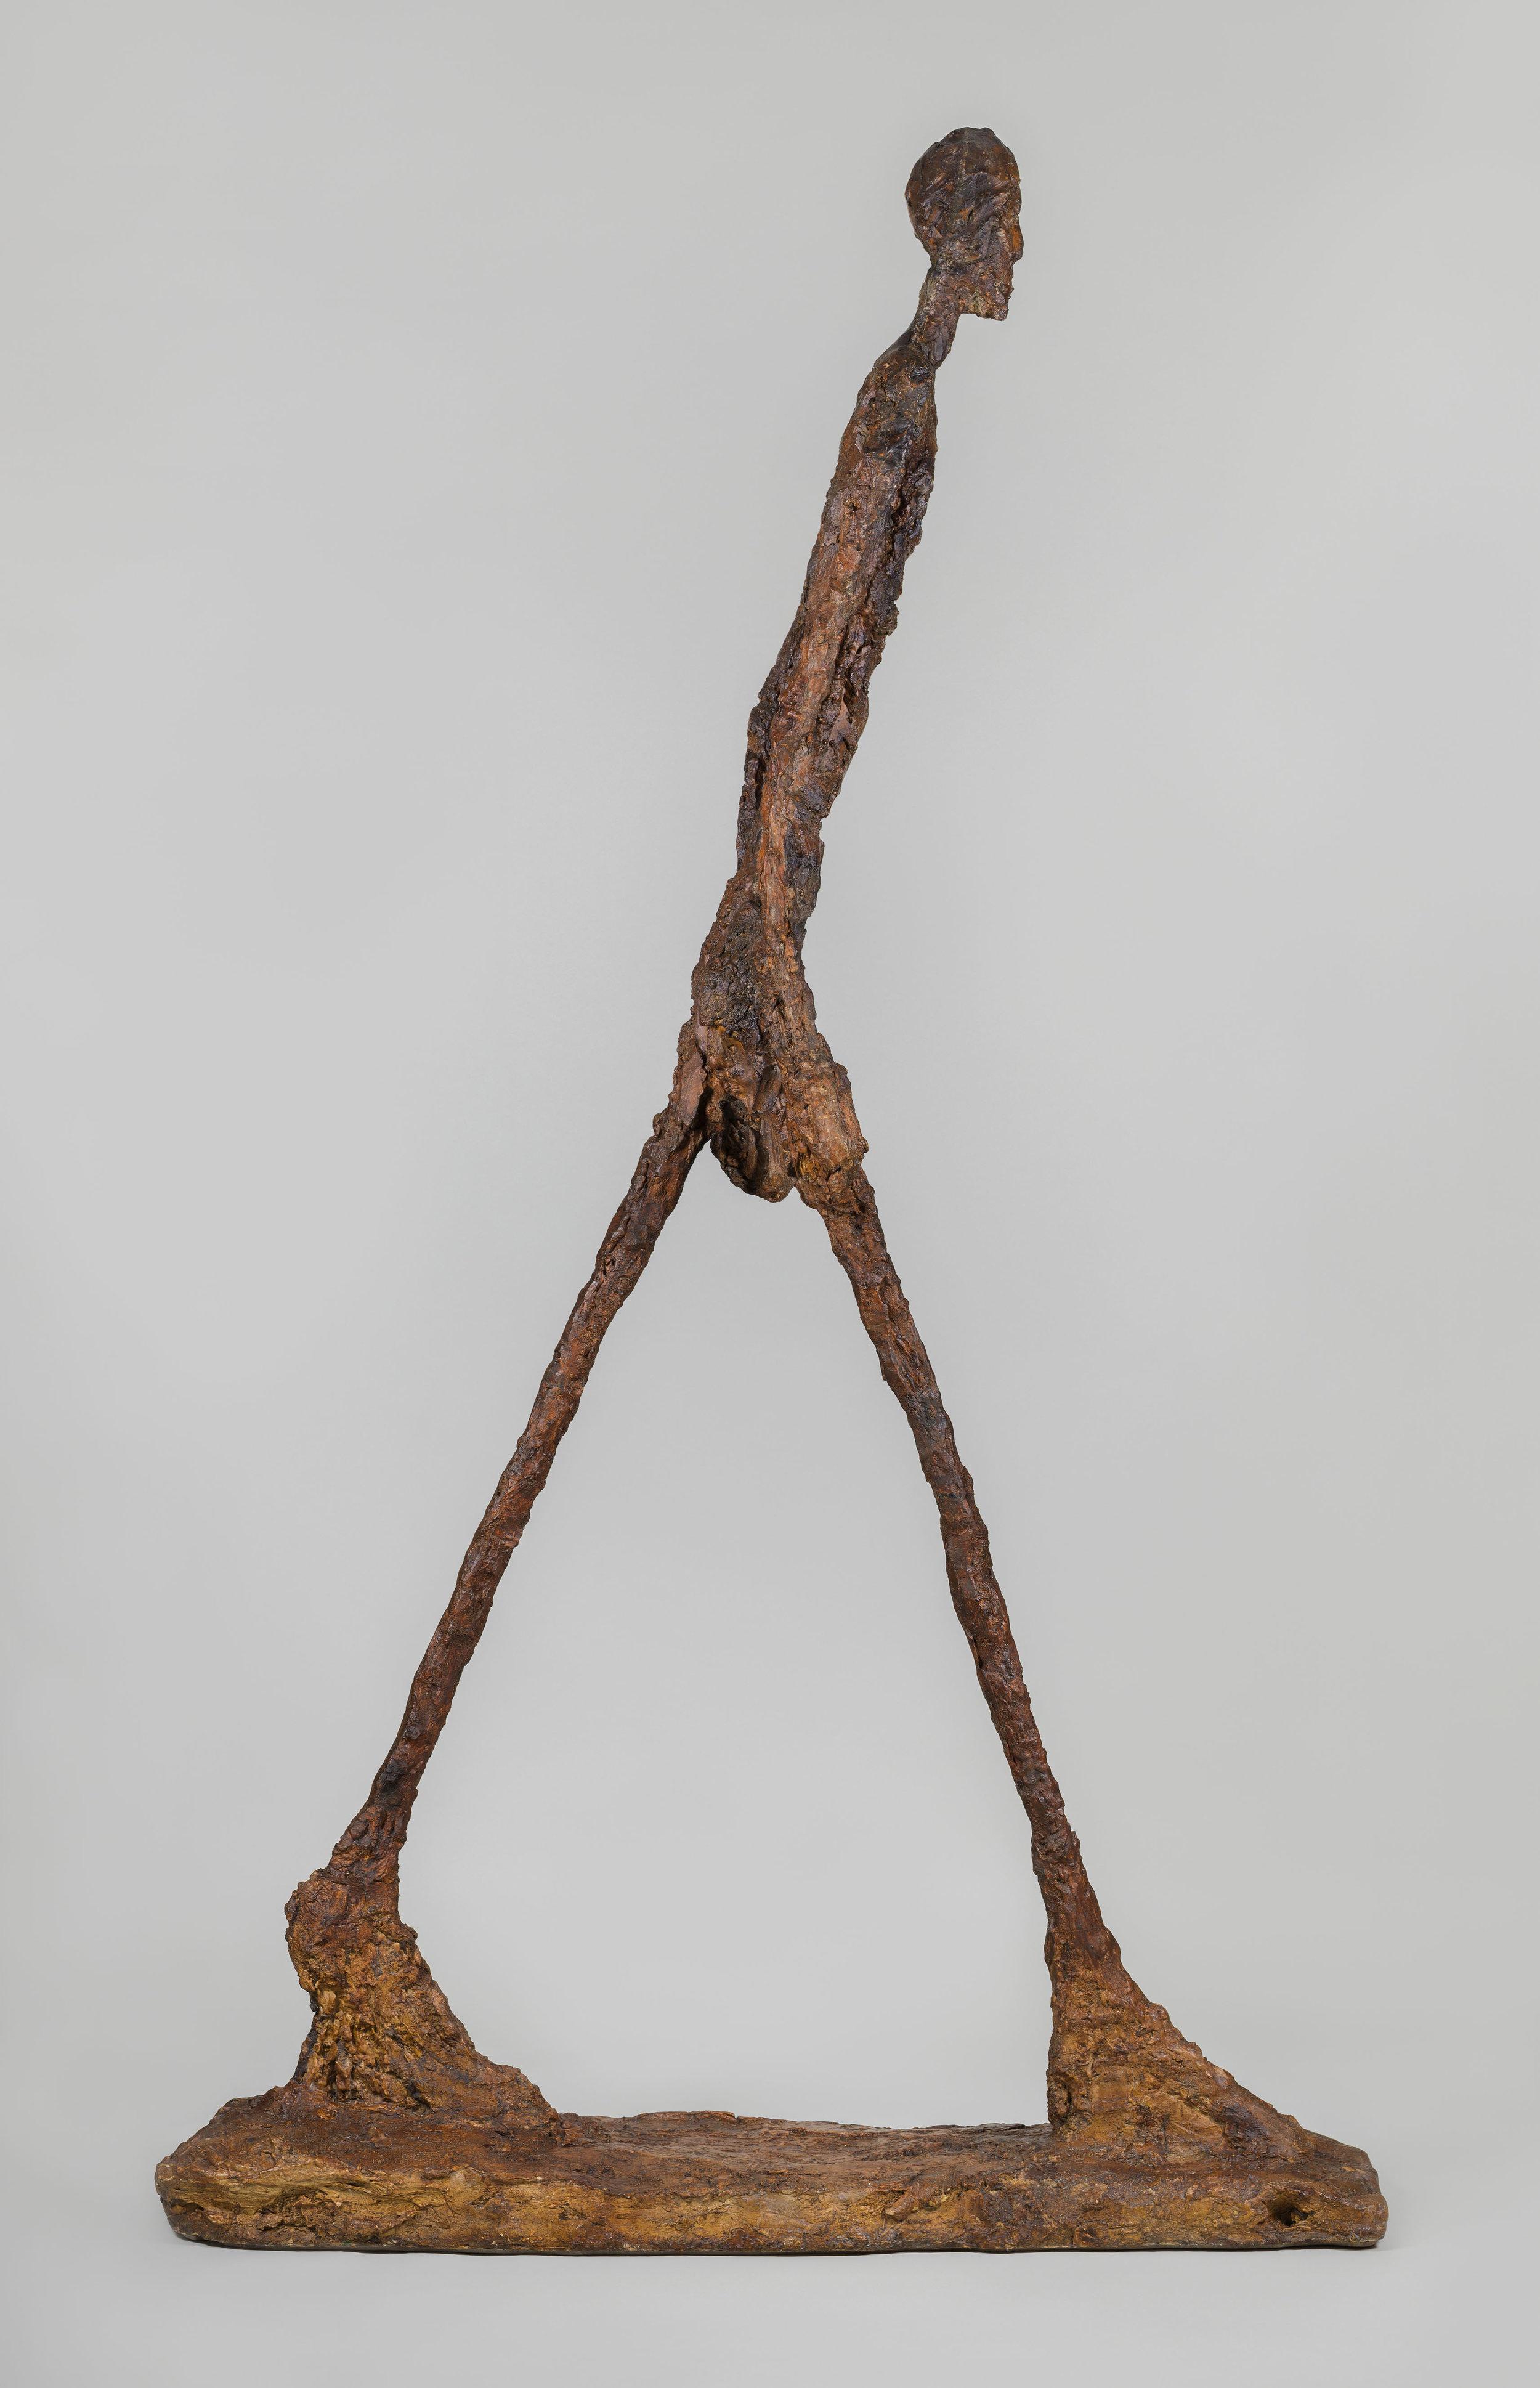 Alberto Giacometti. Walking Man II (1960) Fondation Giacometti, Paris. Courtesy: Alberto Giacometti © Giacometti Estate (Fondation Giacometti + ADAGP)